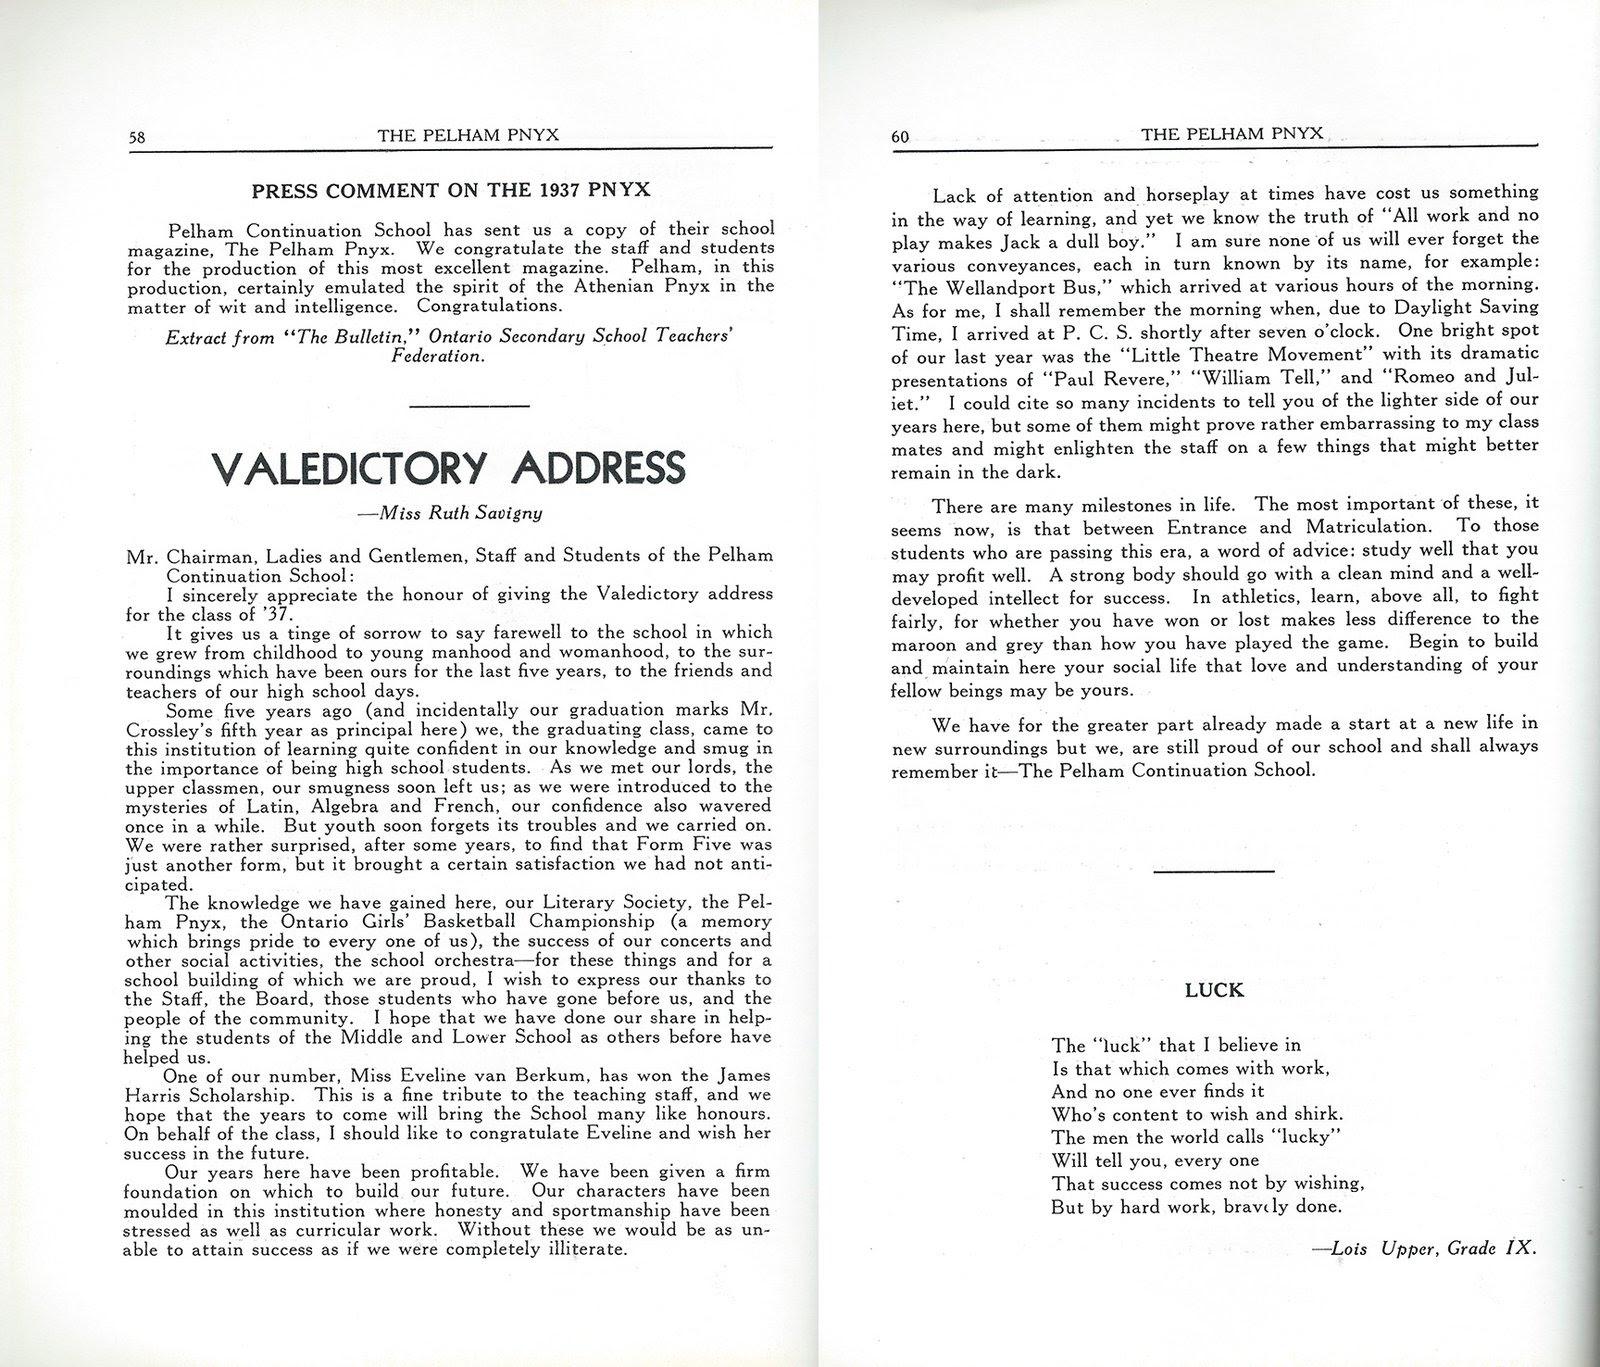 Full Image View Pelham Pnyx 1938 Valedictory Address Press